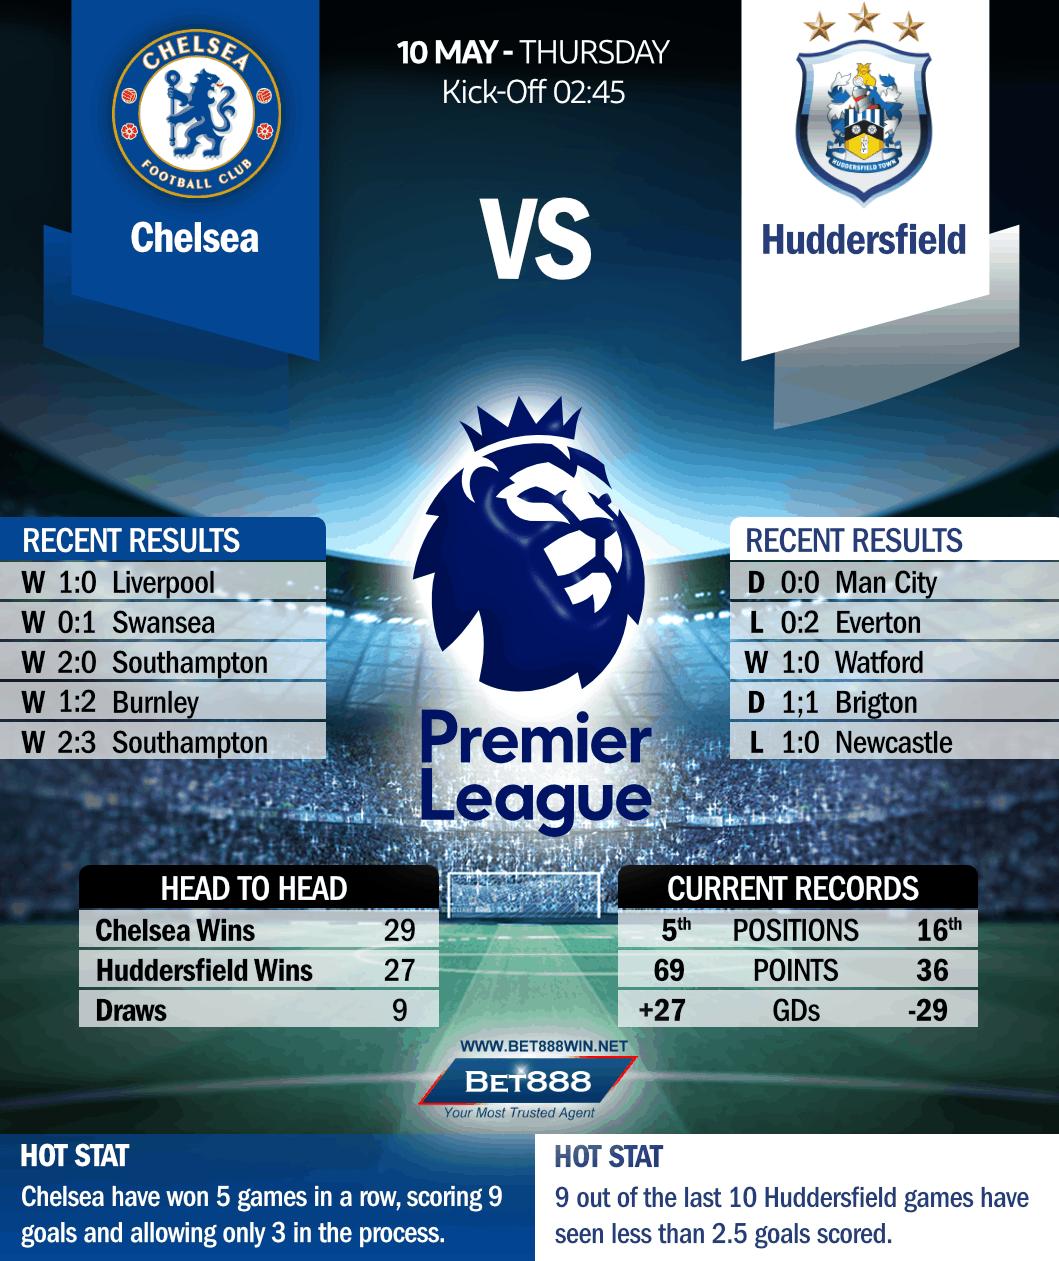 Chelsea vs Huddersfield Town 10/05/18